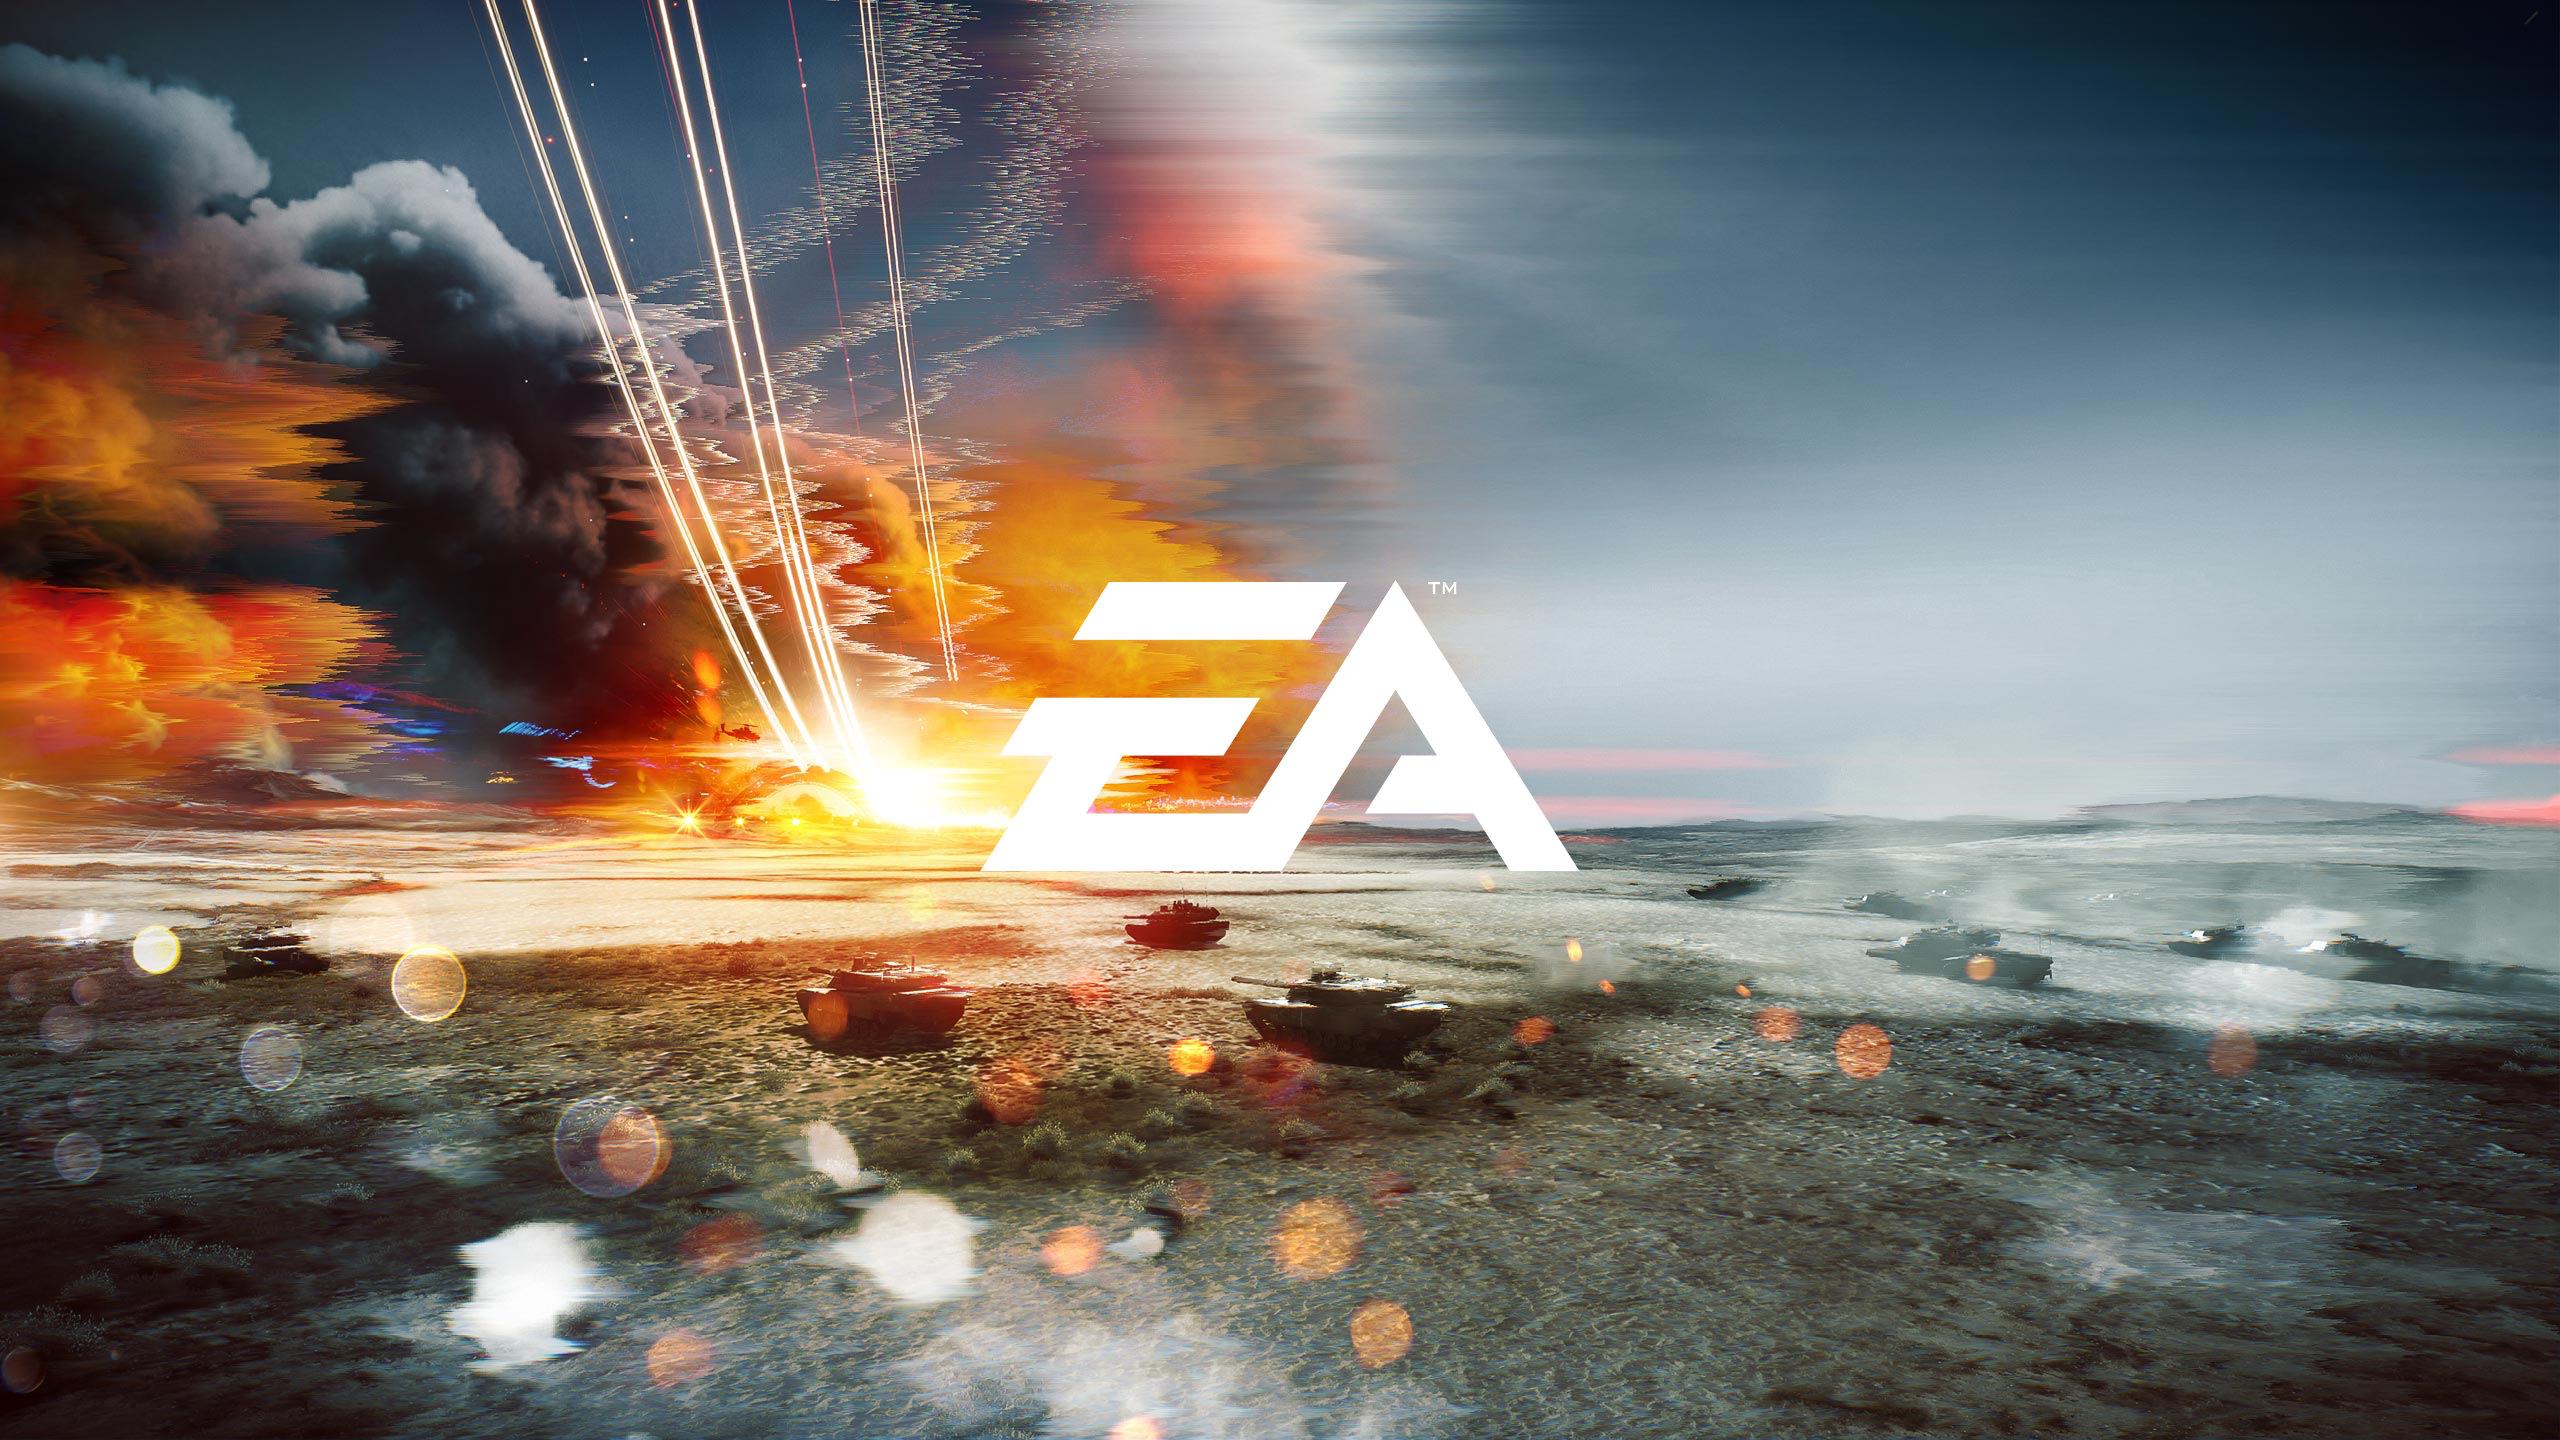 tolleson-work-EA-battlefield